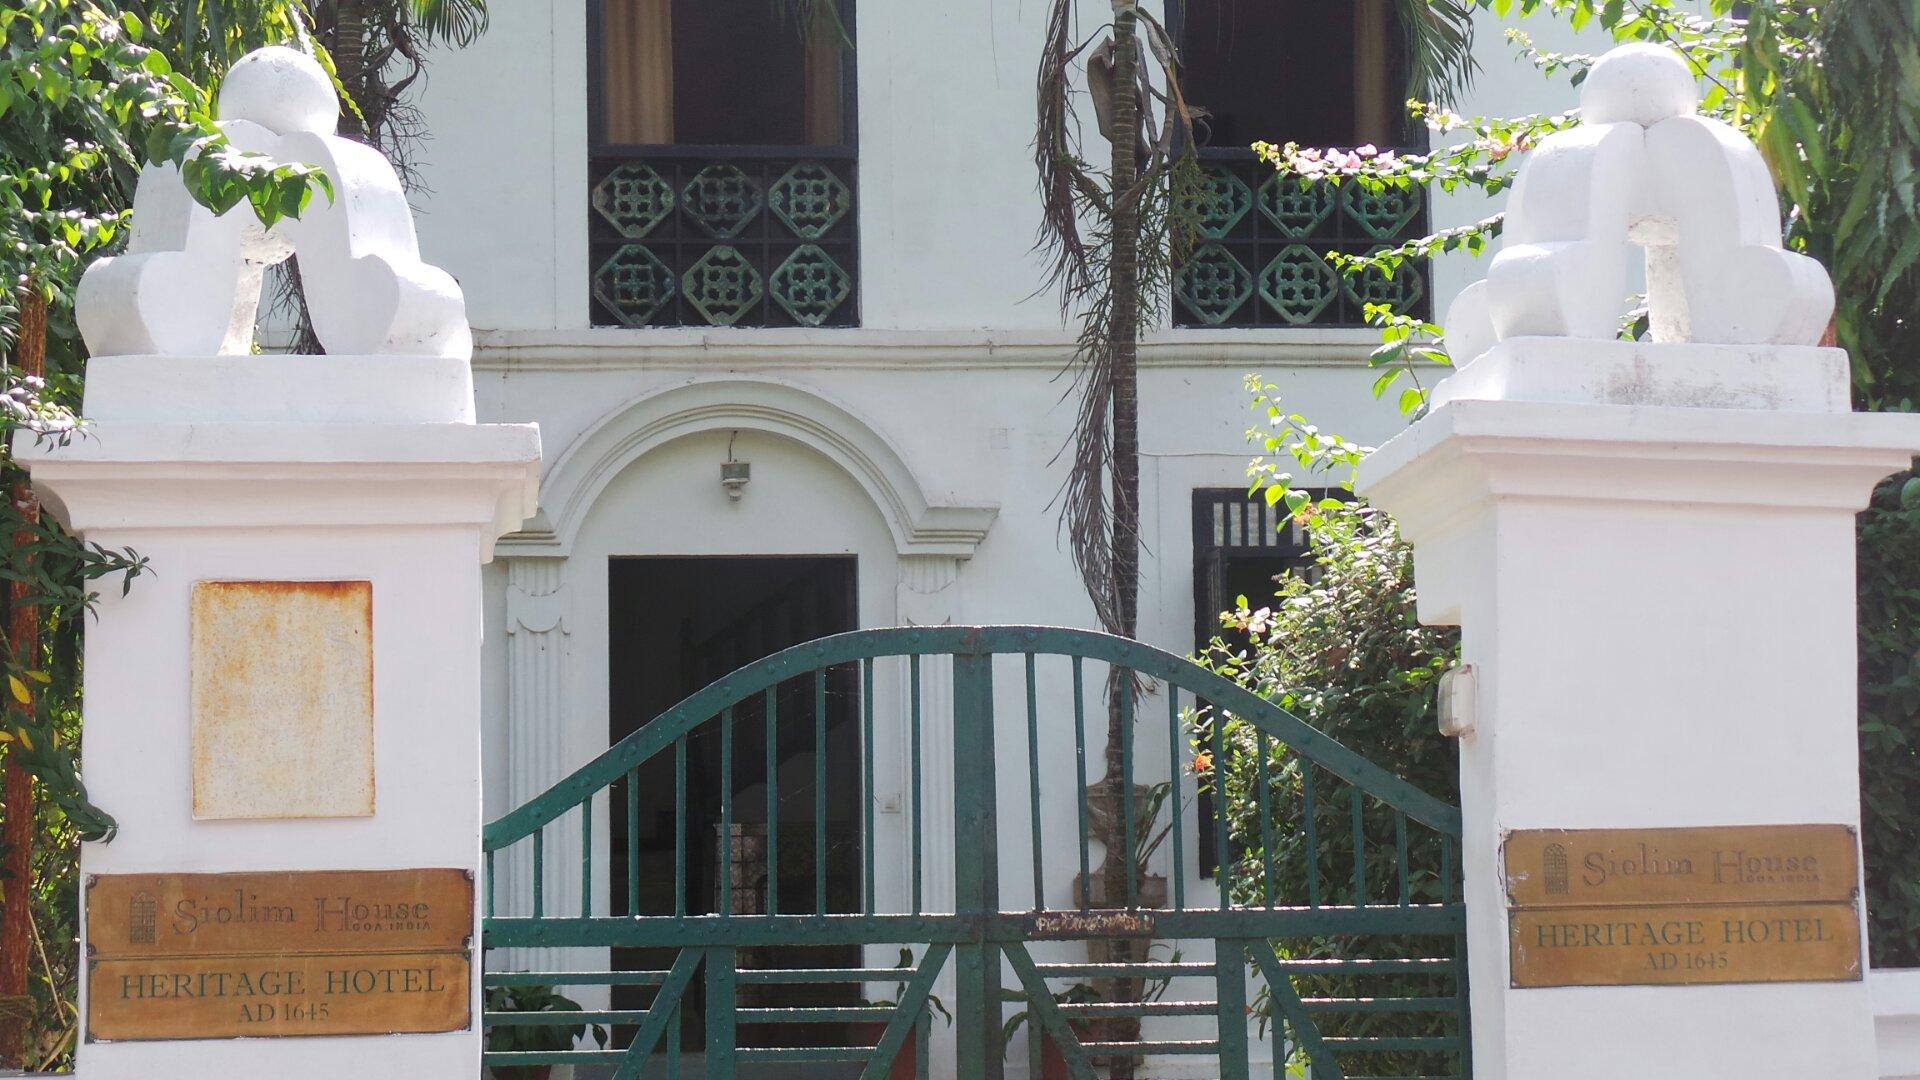 Siolim House in Goa